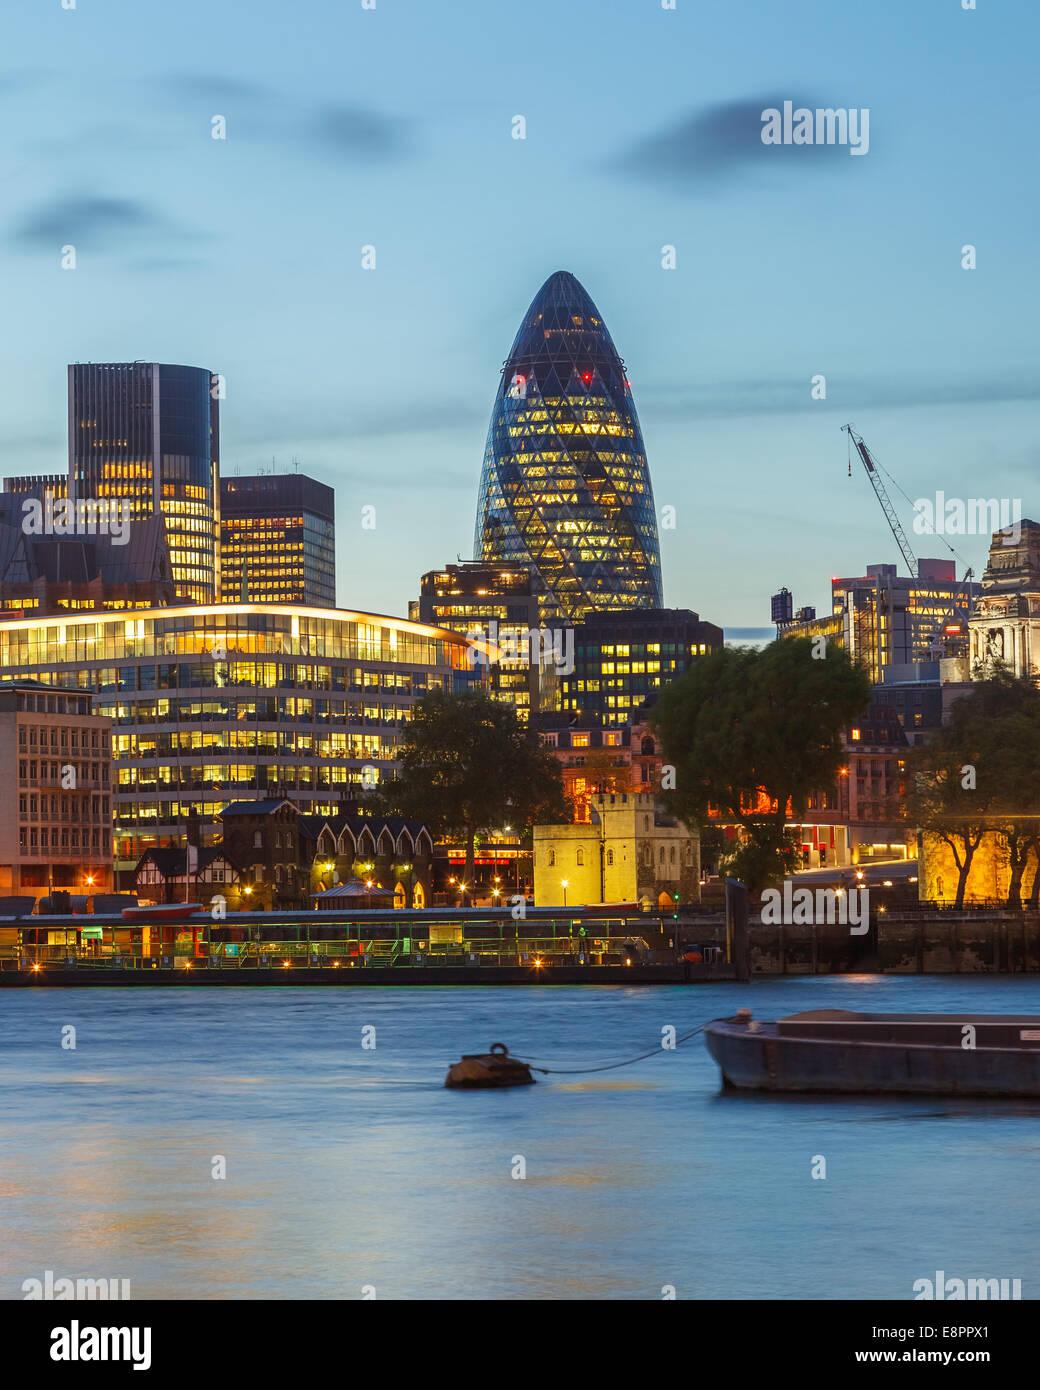 London City at night - Stock Image